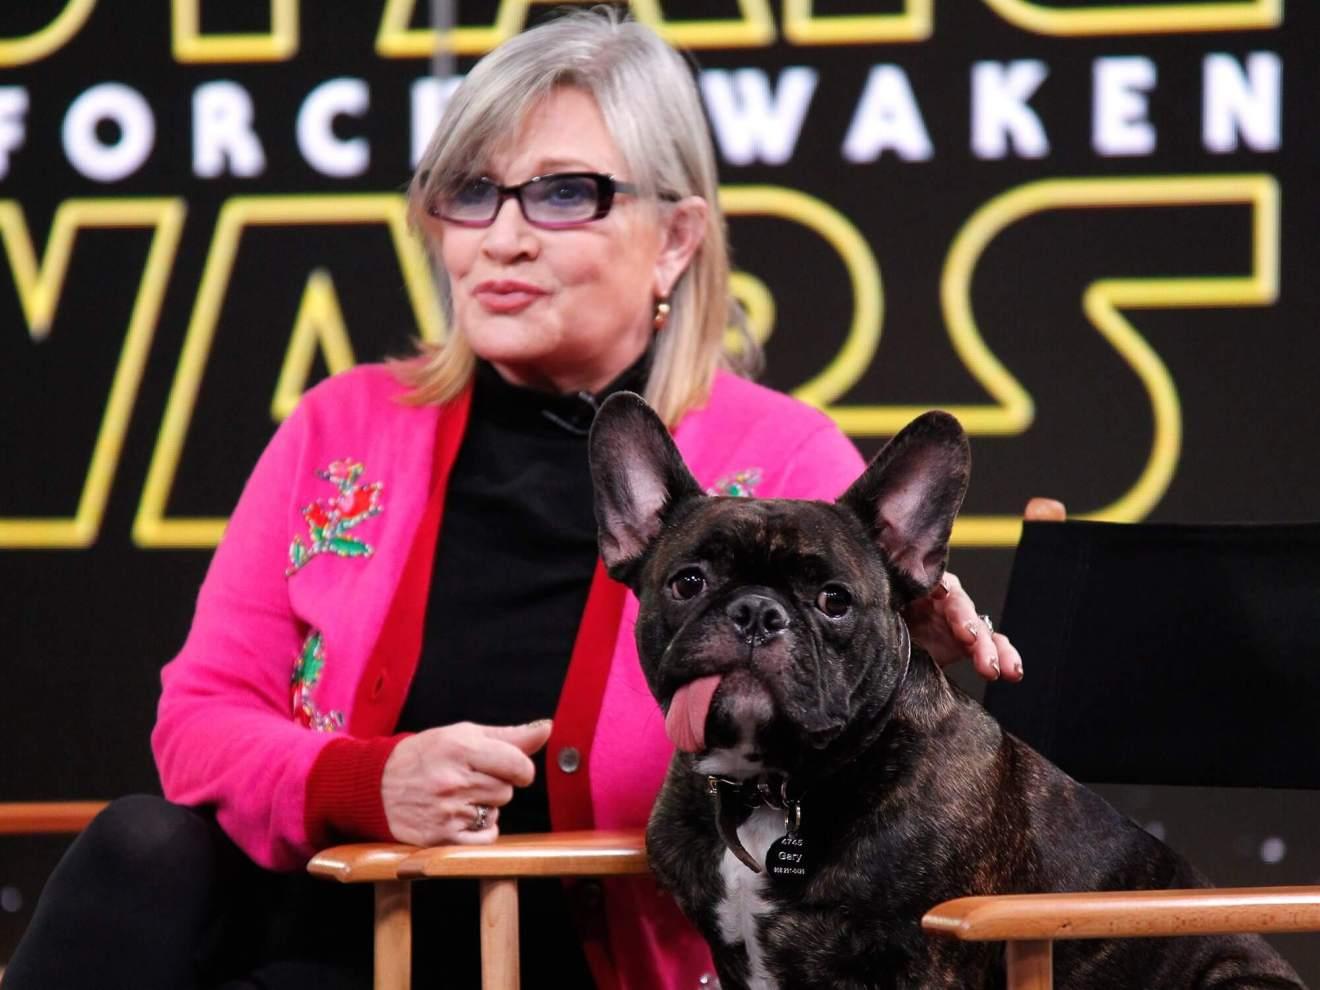 1 ano sem Carrie Fisher, a eterna Princesa Leia 9